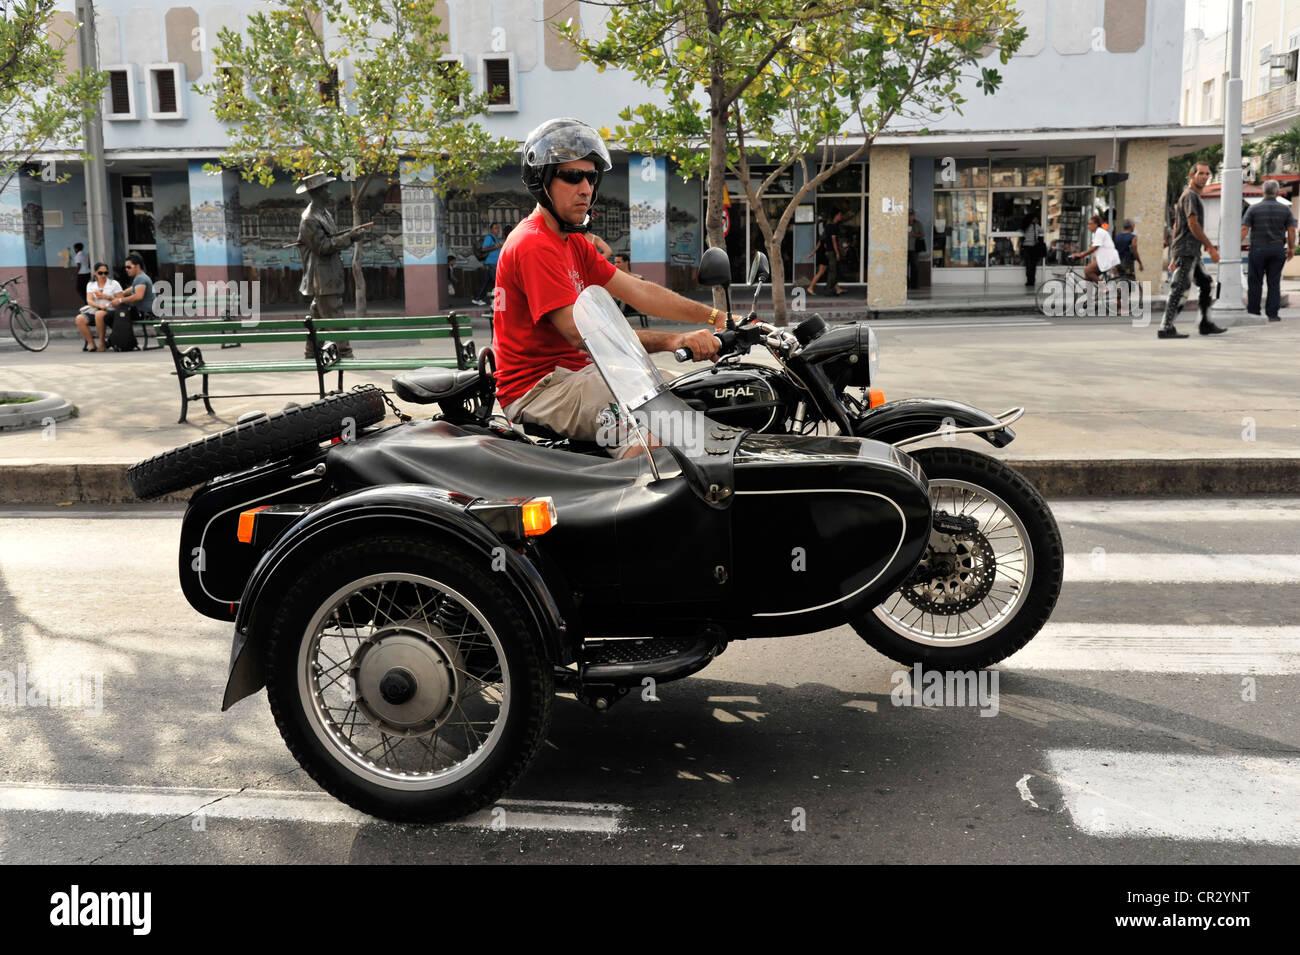 ural motorrad aus russland motorrad mit beiwagen. Black Bedroom Furniture Sets. Home Design Ideas